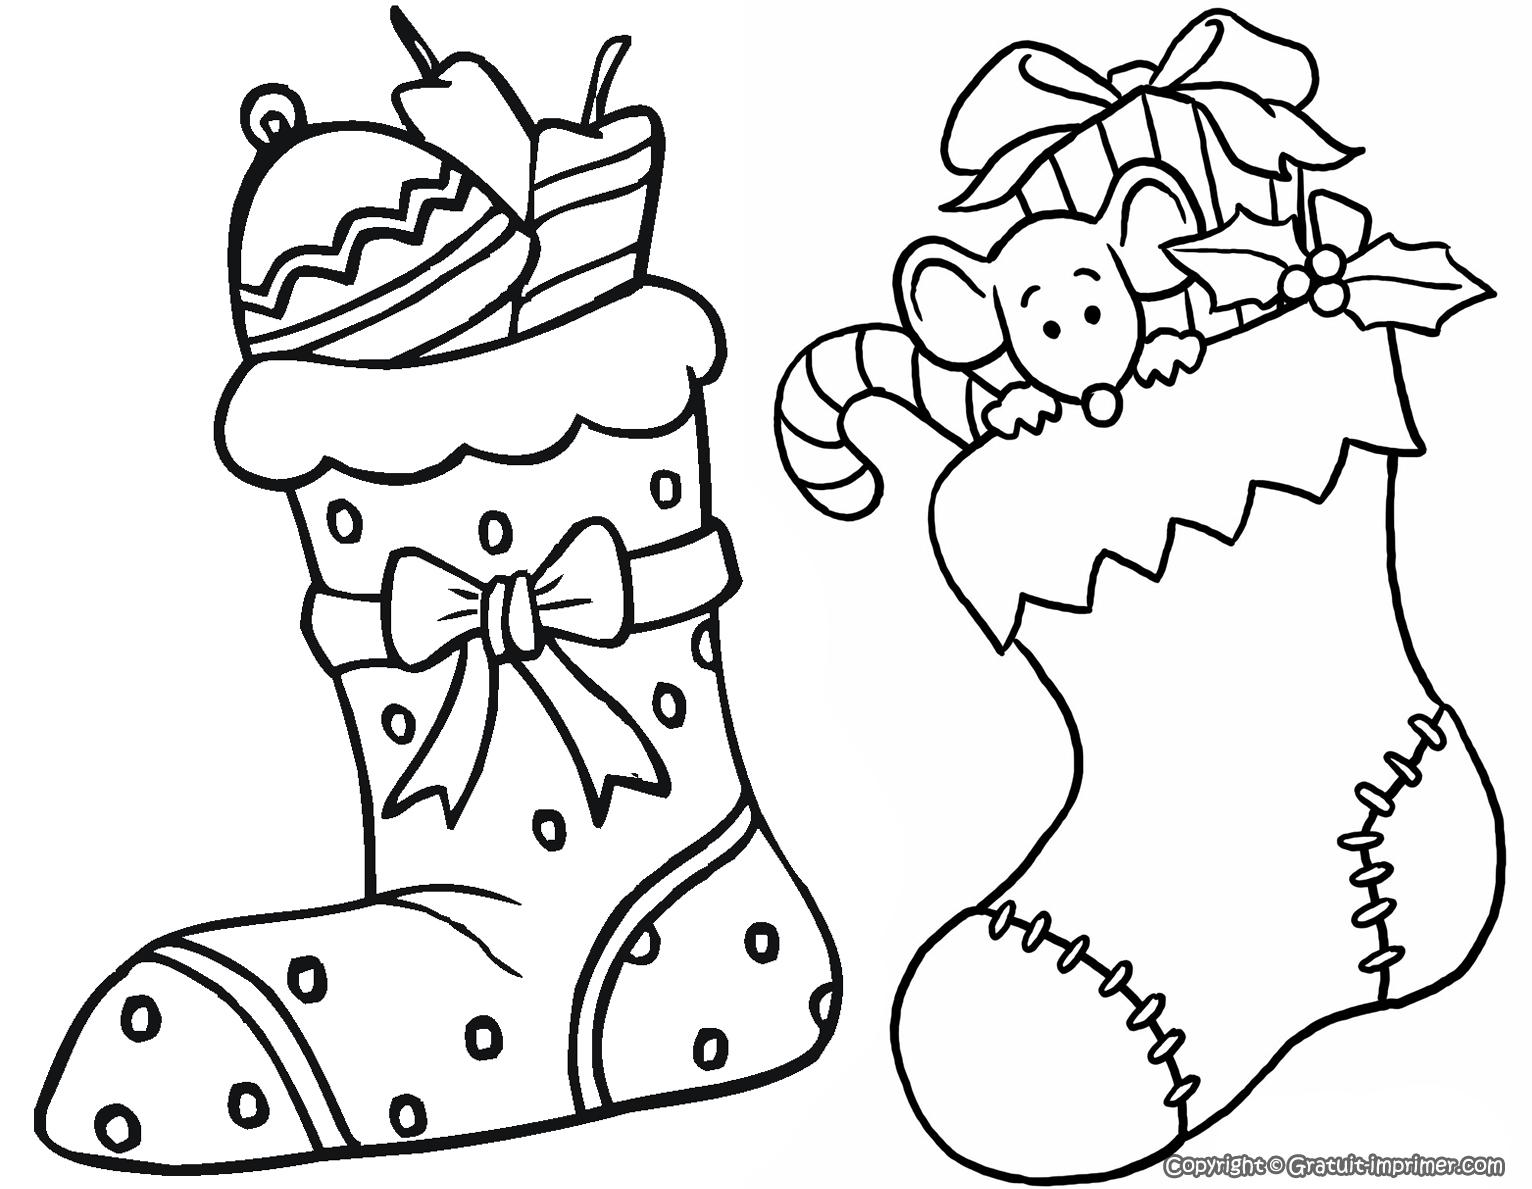 dessin de noel (3)